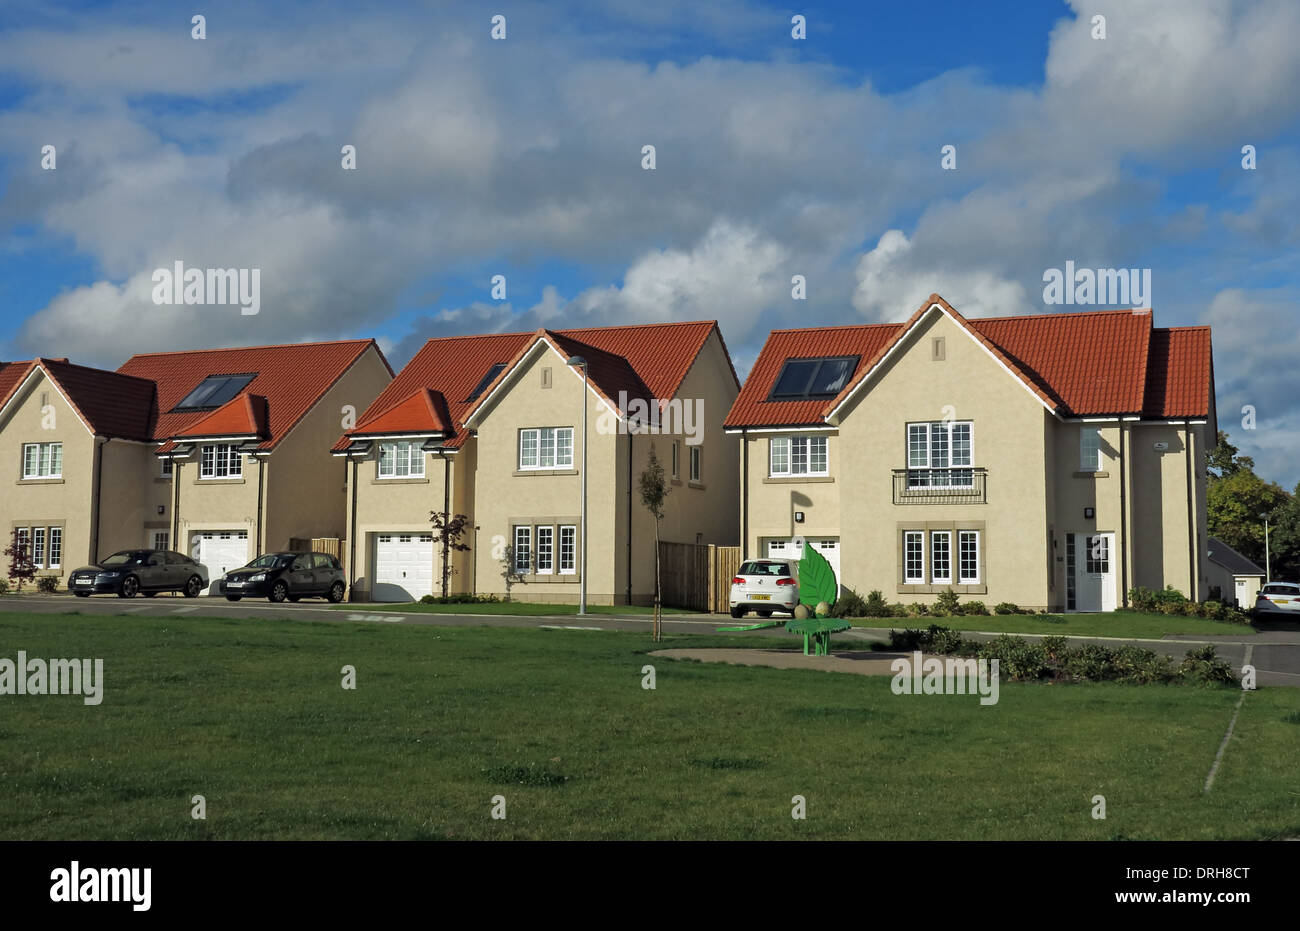 New build houses on an estate Eskbank, near Dalkeith Edinburgh Midlothian Scotland - Stock Image